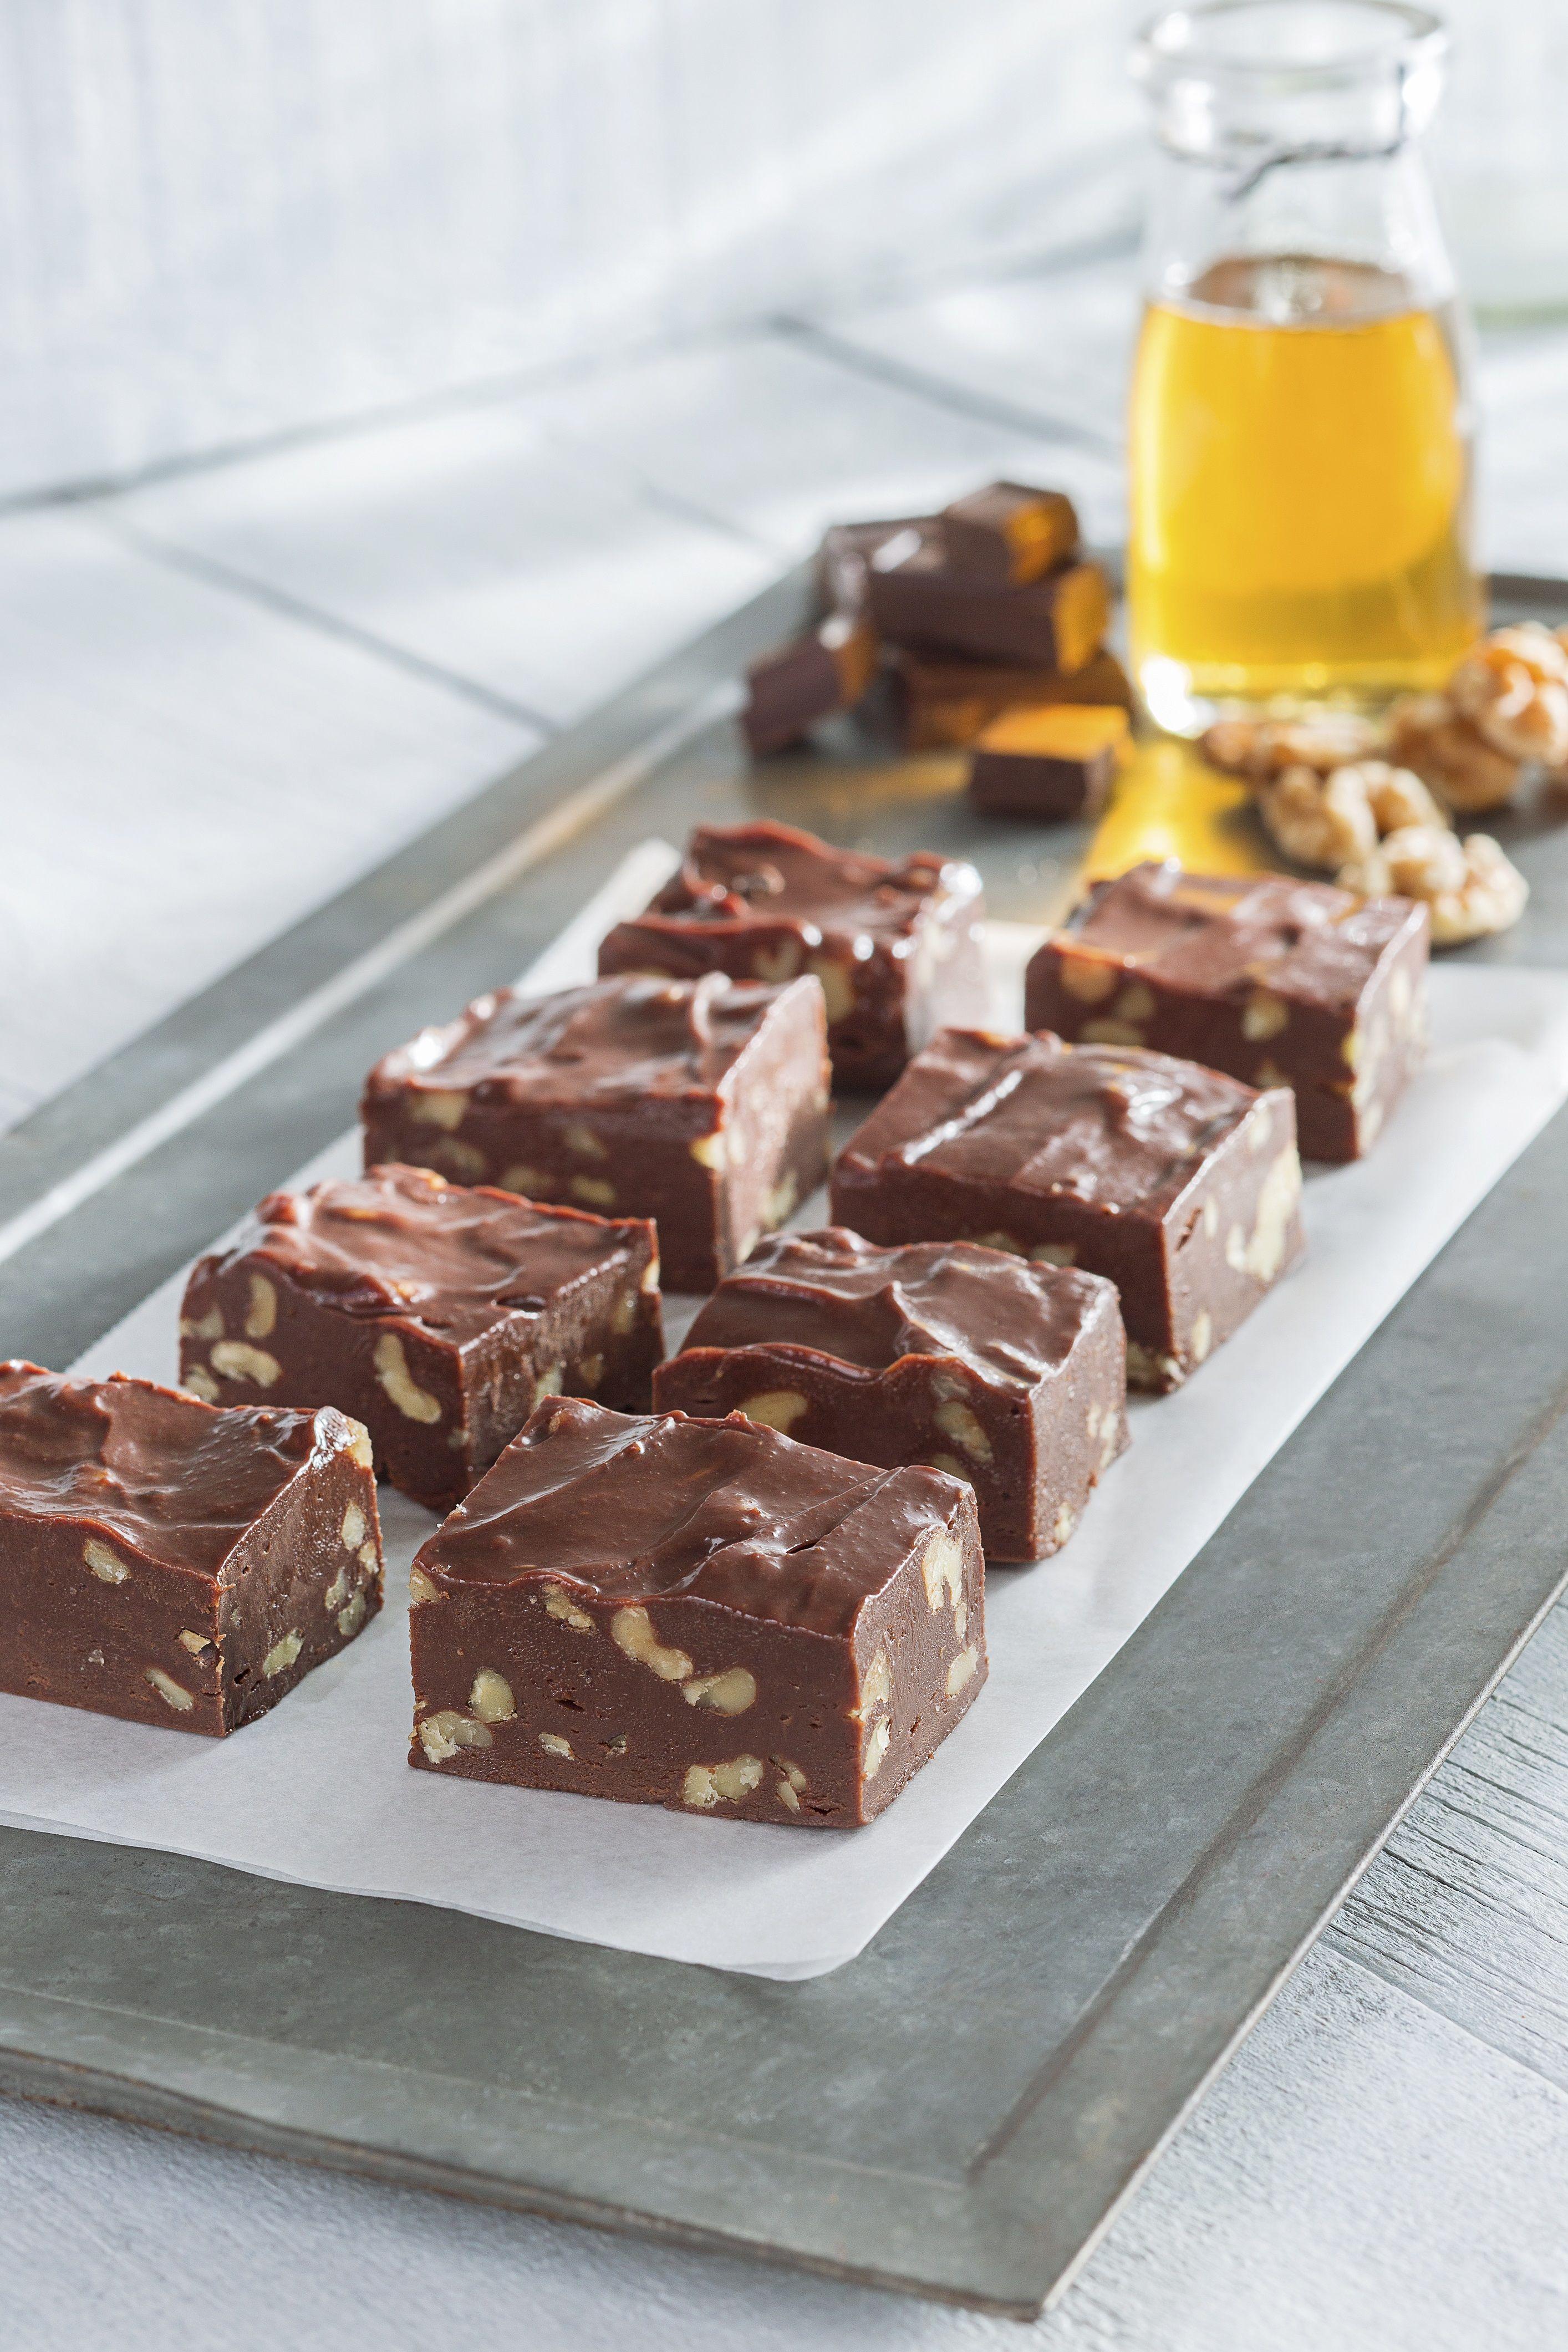 Chocolate Walnut Fudge Recipe Walnut Fudge Chocolate Walnut Fudge Fudge Recipes